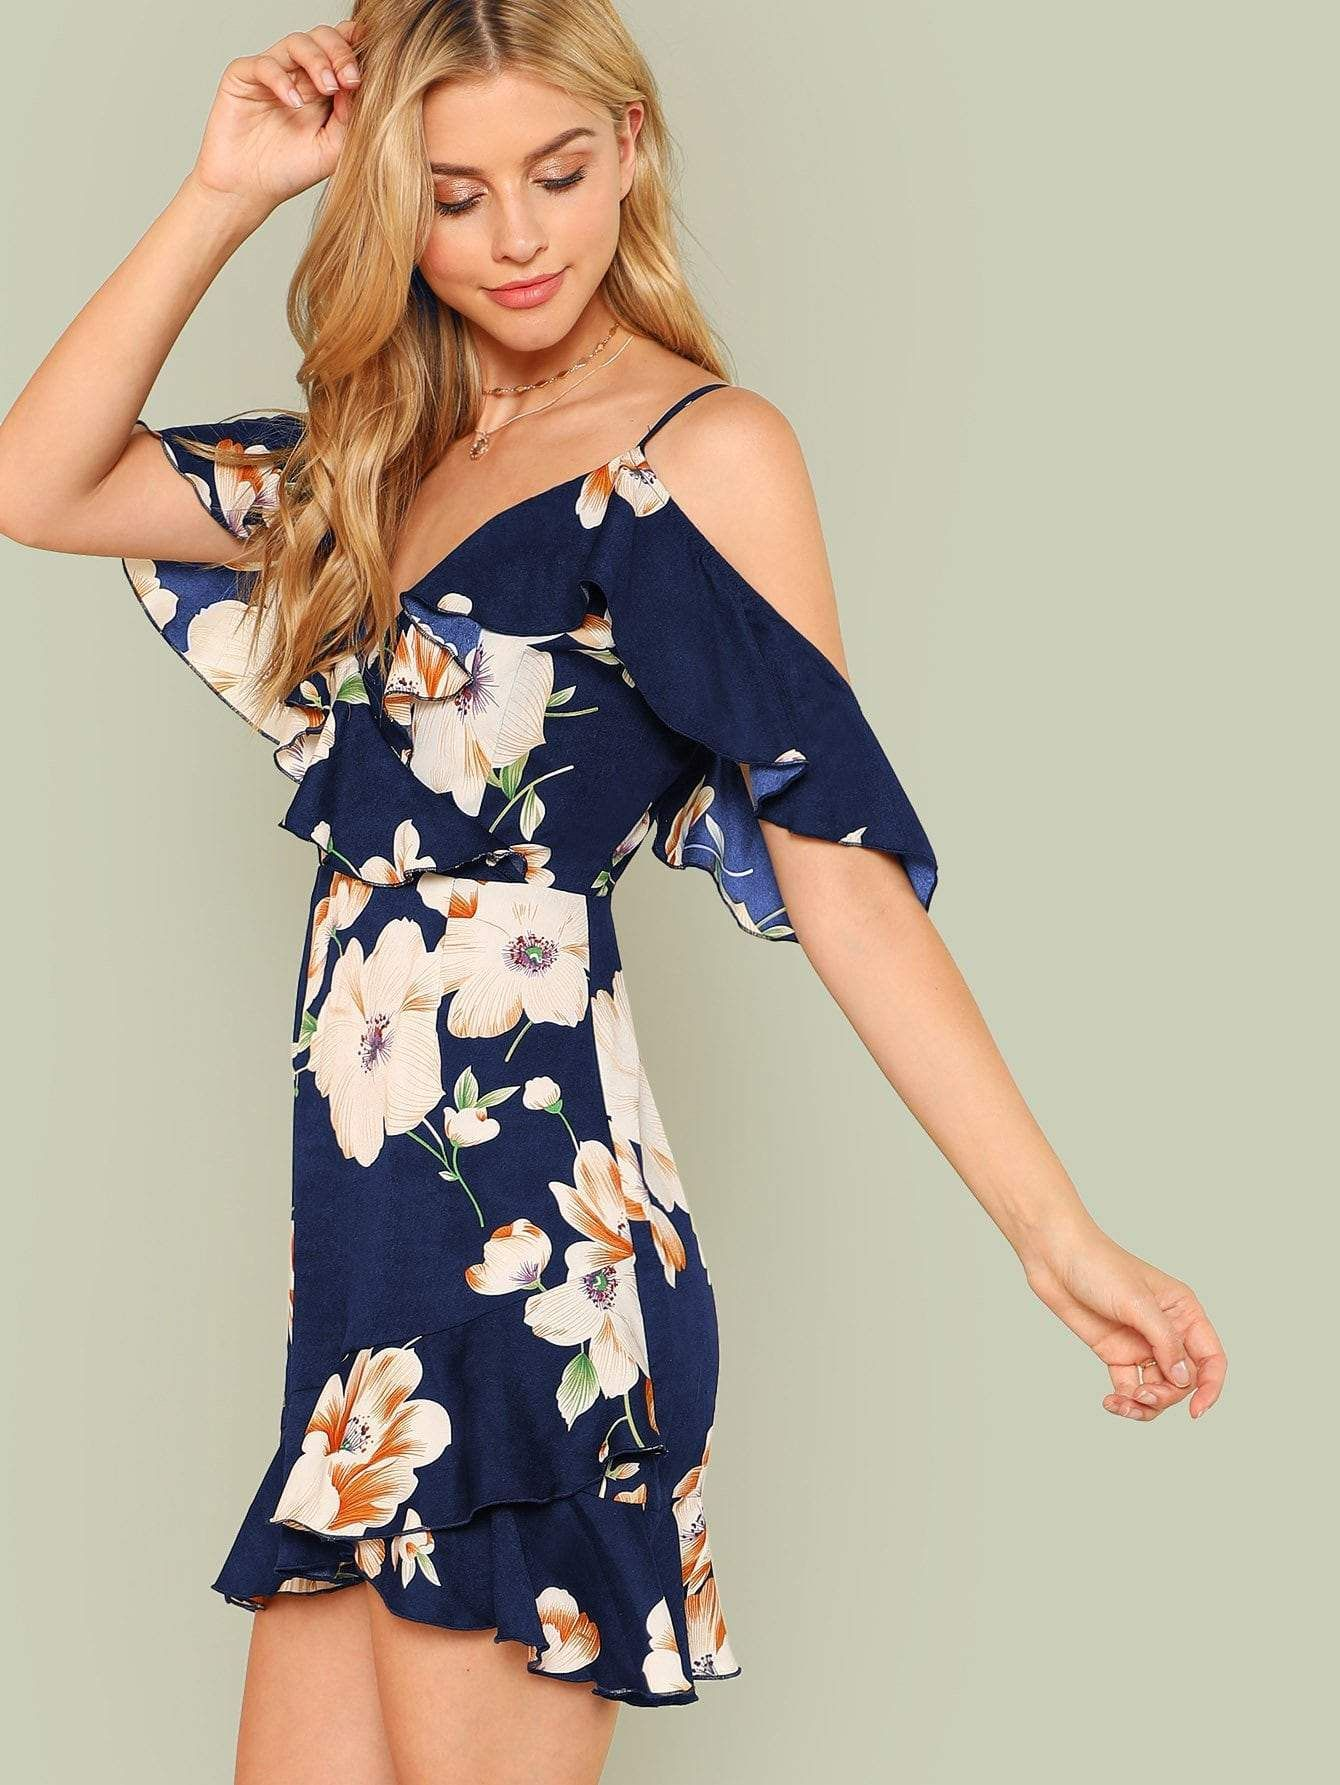 Flounce Cold Shoulder Ruffle Hem Floral Dress Cold Shoulder Floral Dress Boho Bohemian Dress Printed Summer Dresses [ 1785 x 1340 Pixel ]